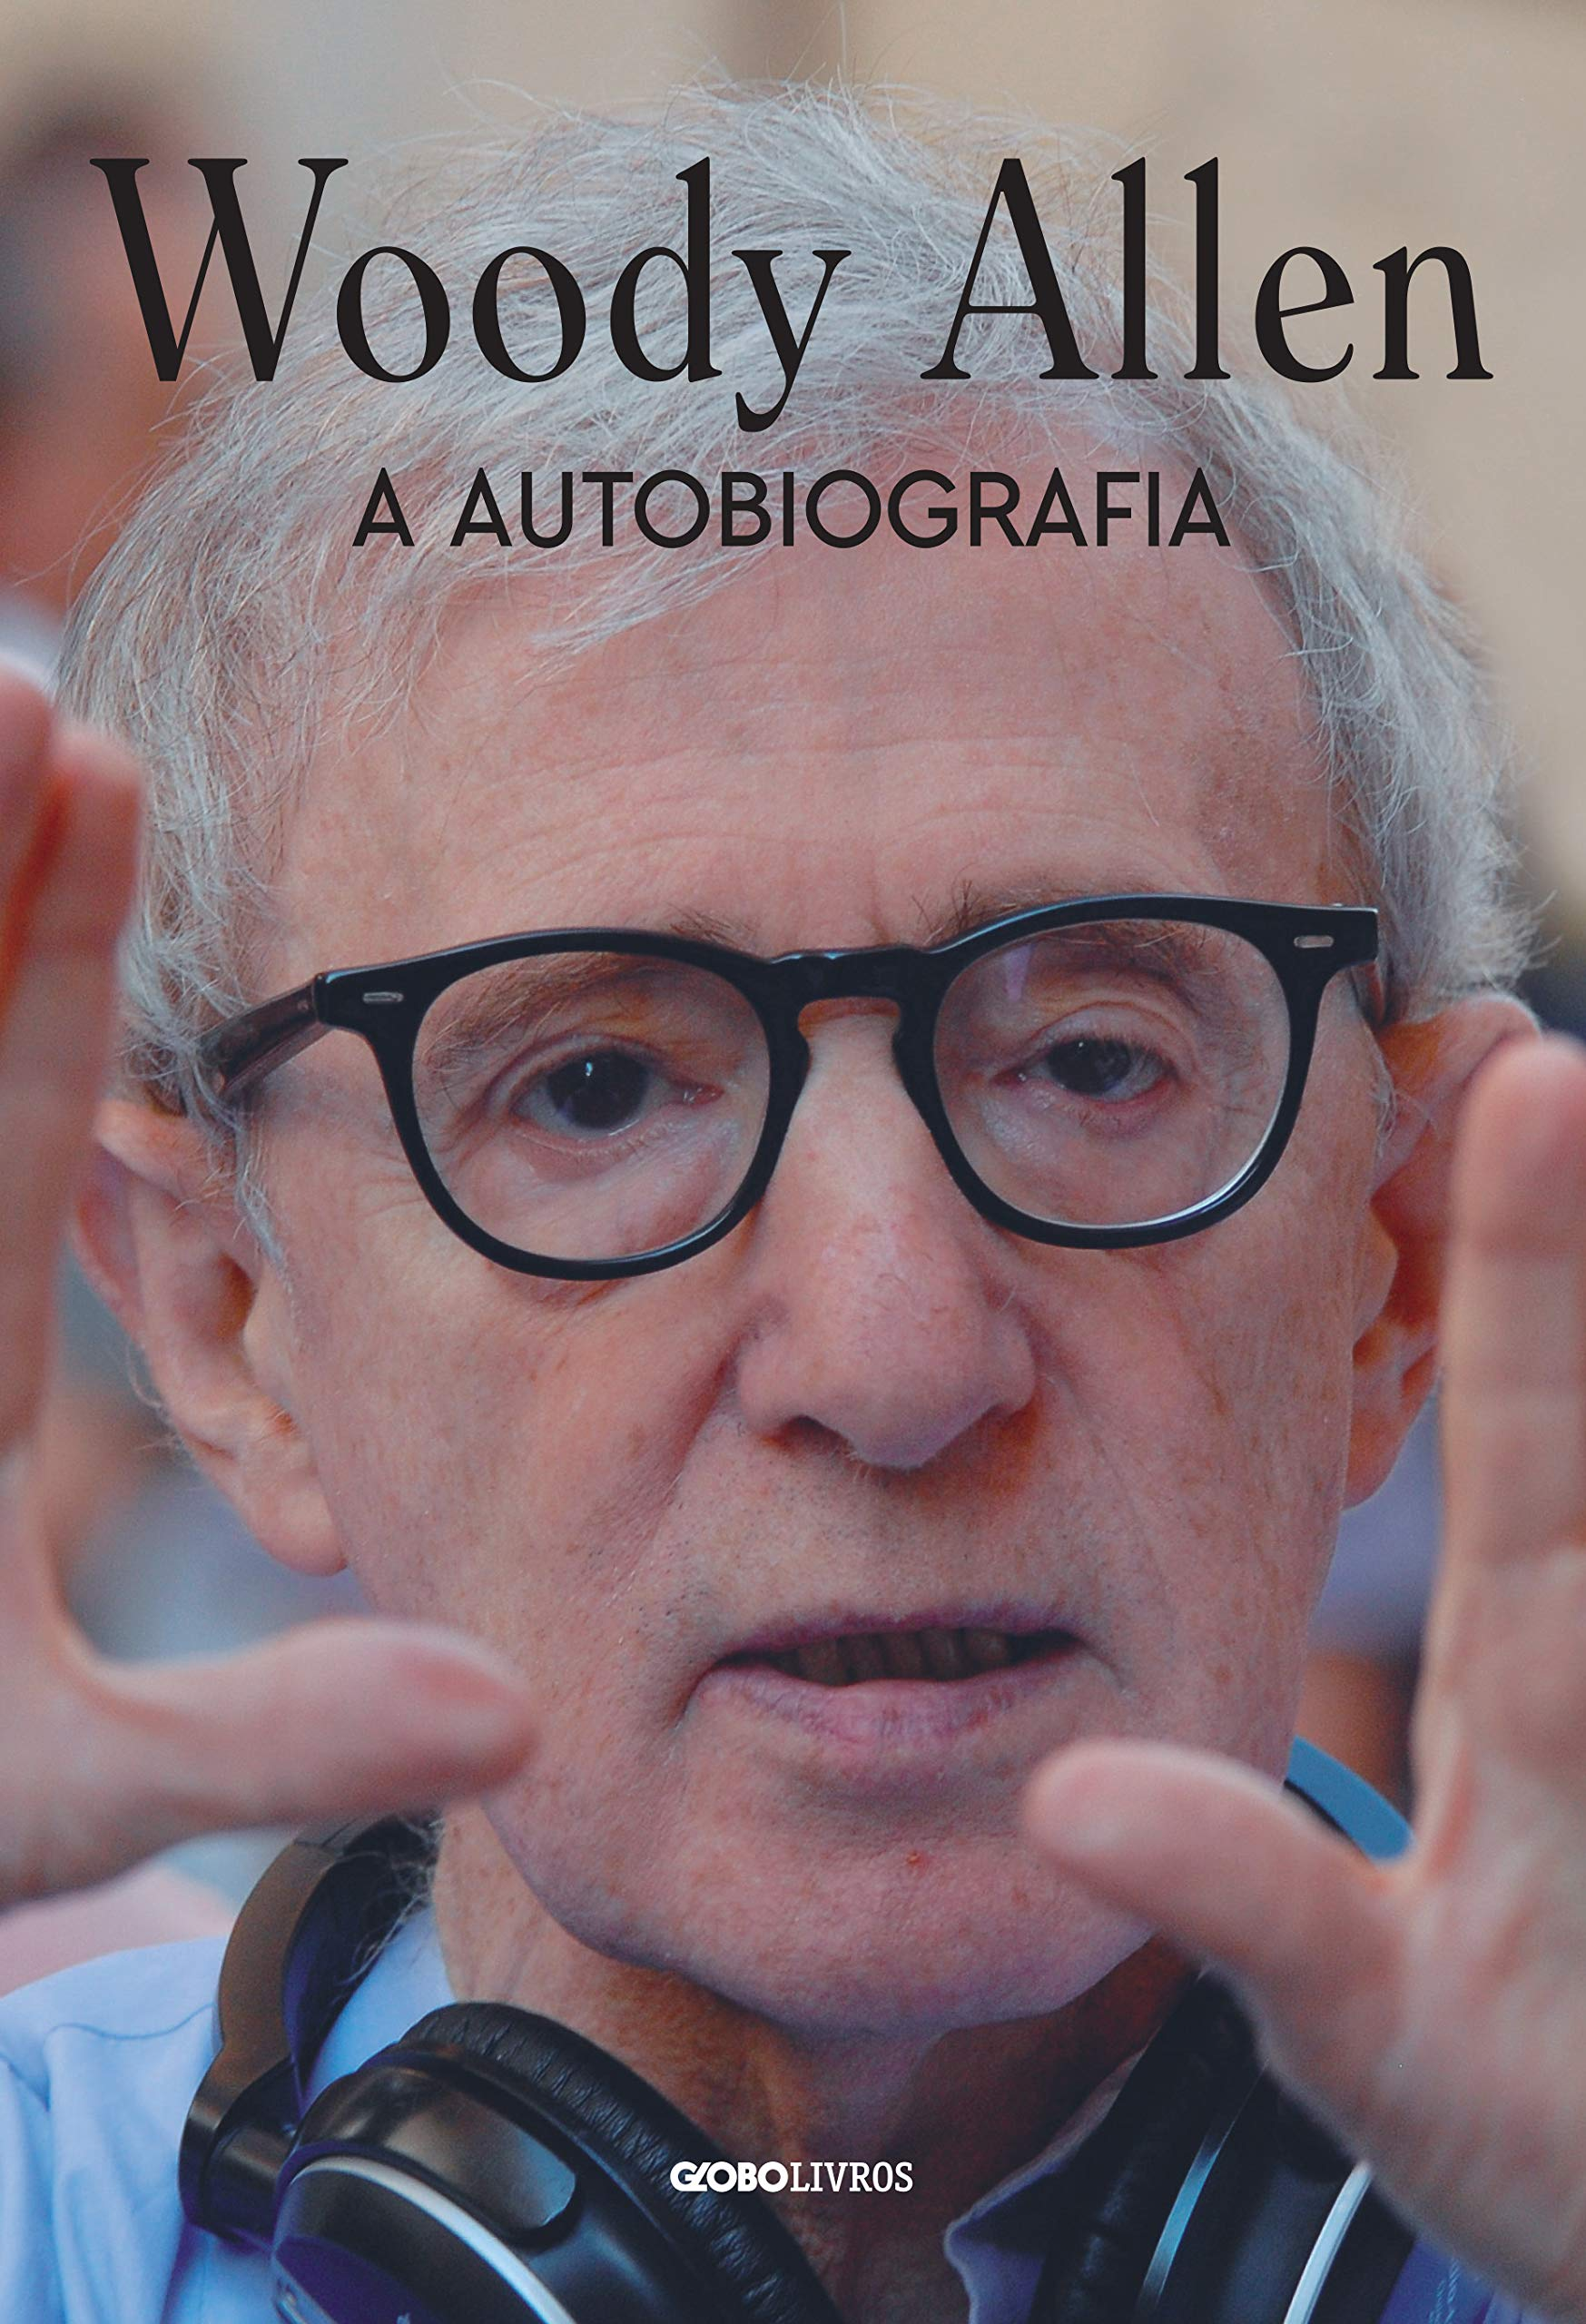 Woody Allen: a autobiografia | Amazon.com.br